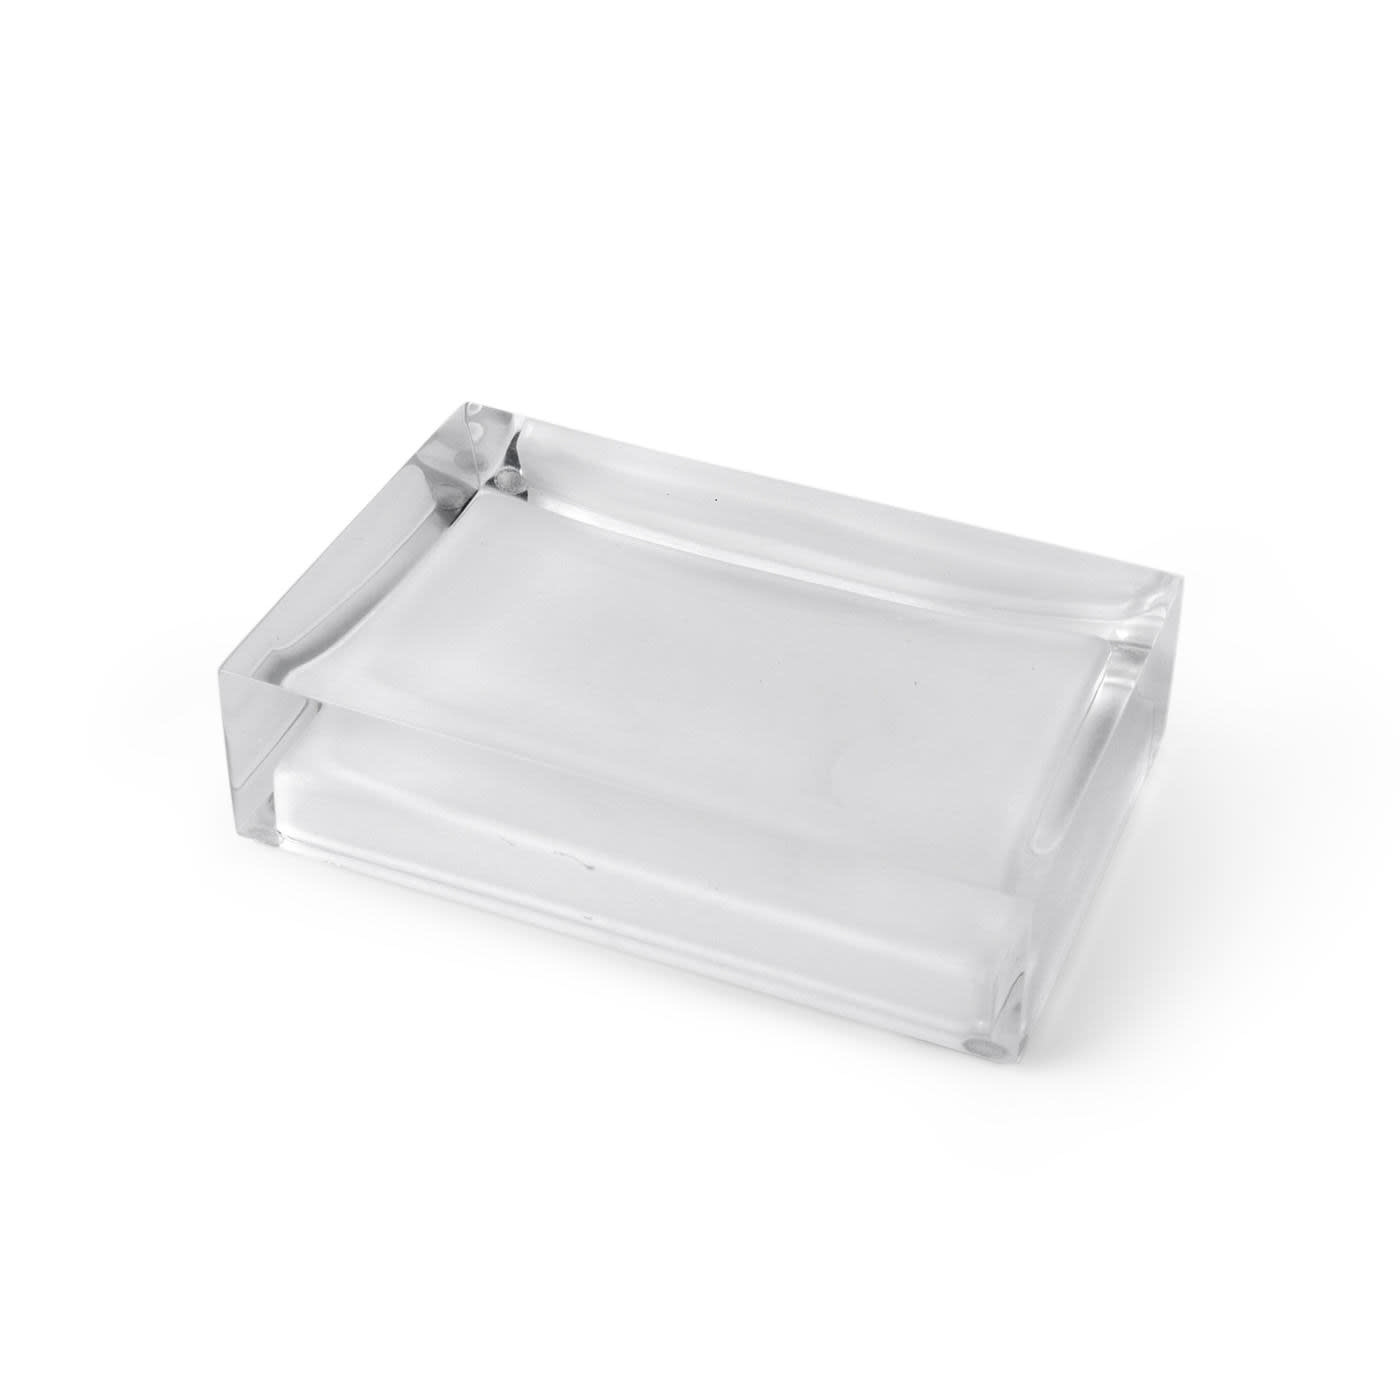 Jonathan Adler Jonathan Adler Hollywood Soap Dish  Clear